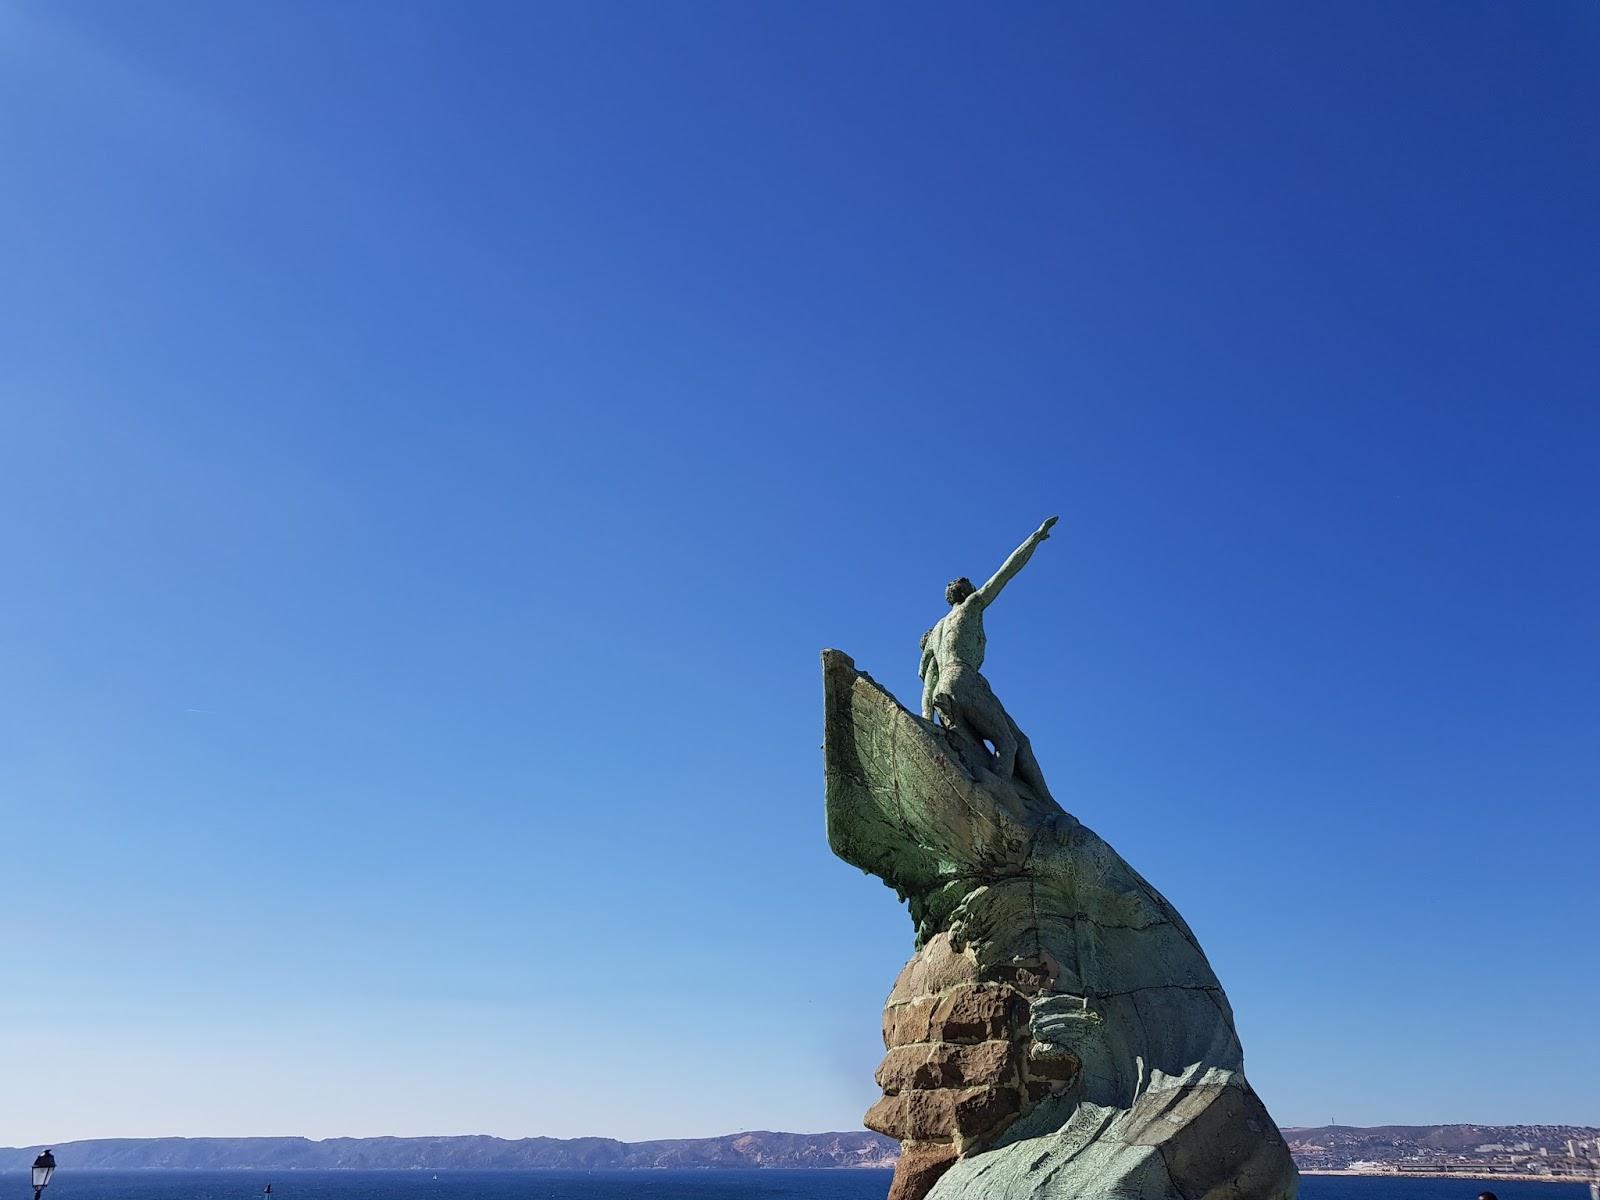 ciel bleu de Marseille